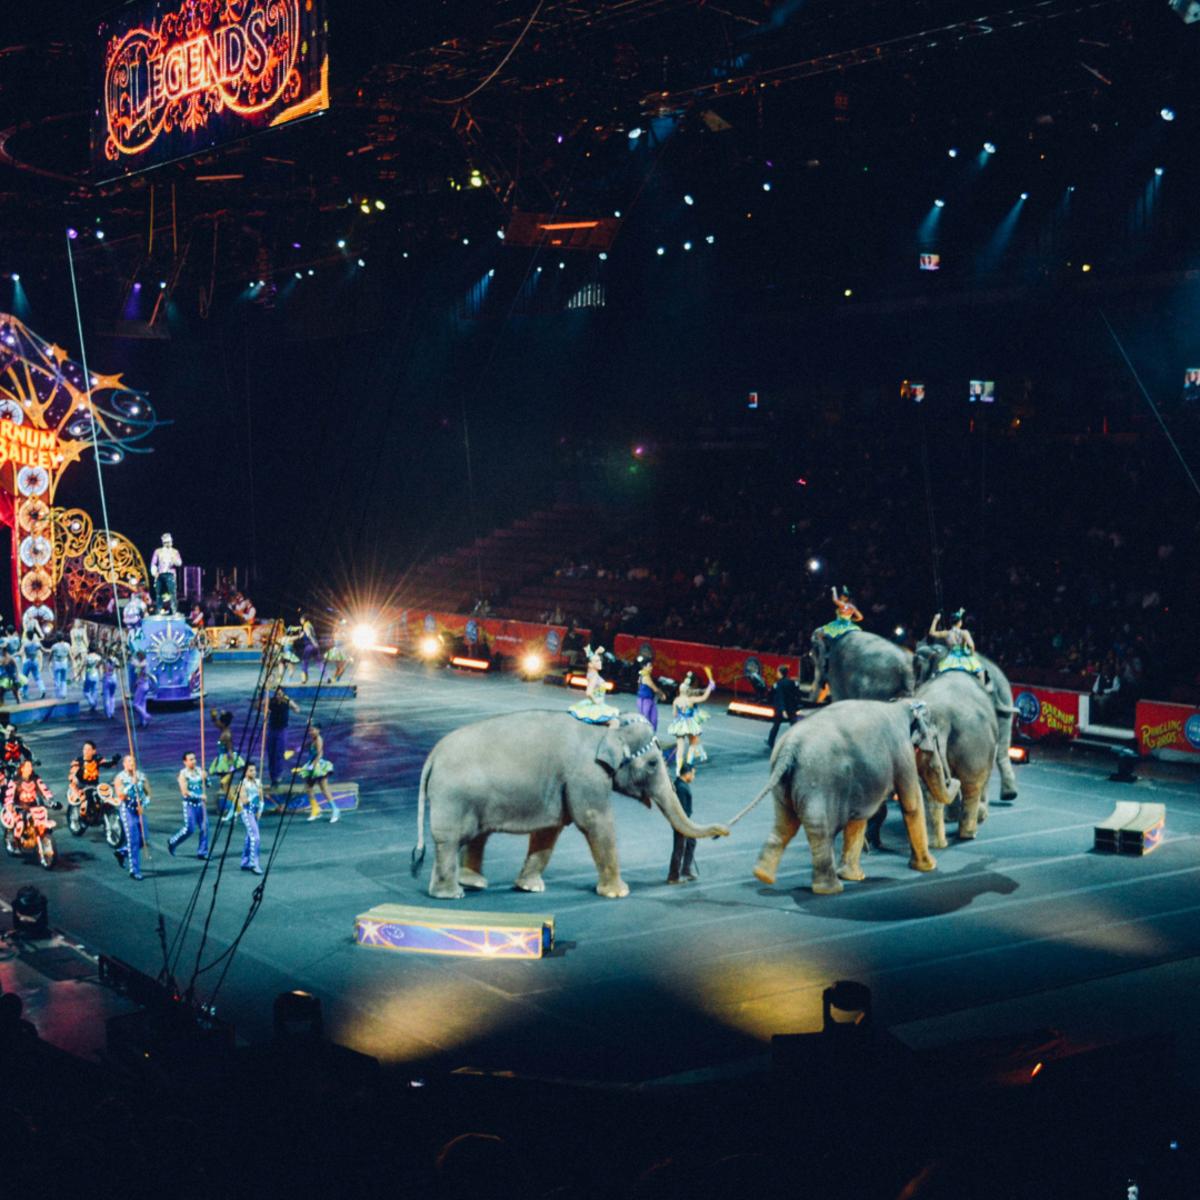 Circuses violate many animal rights.